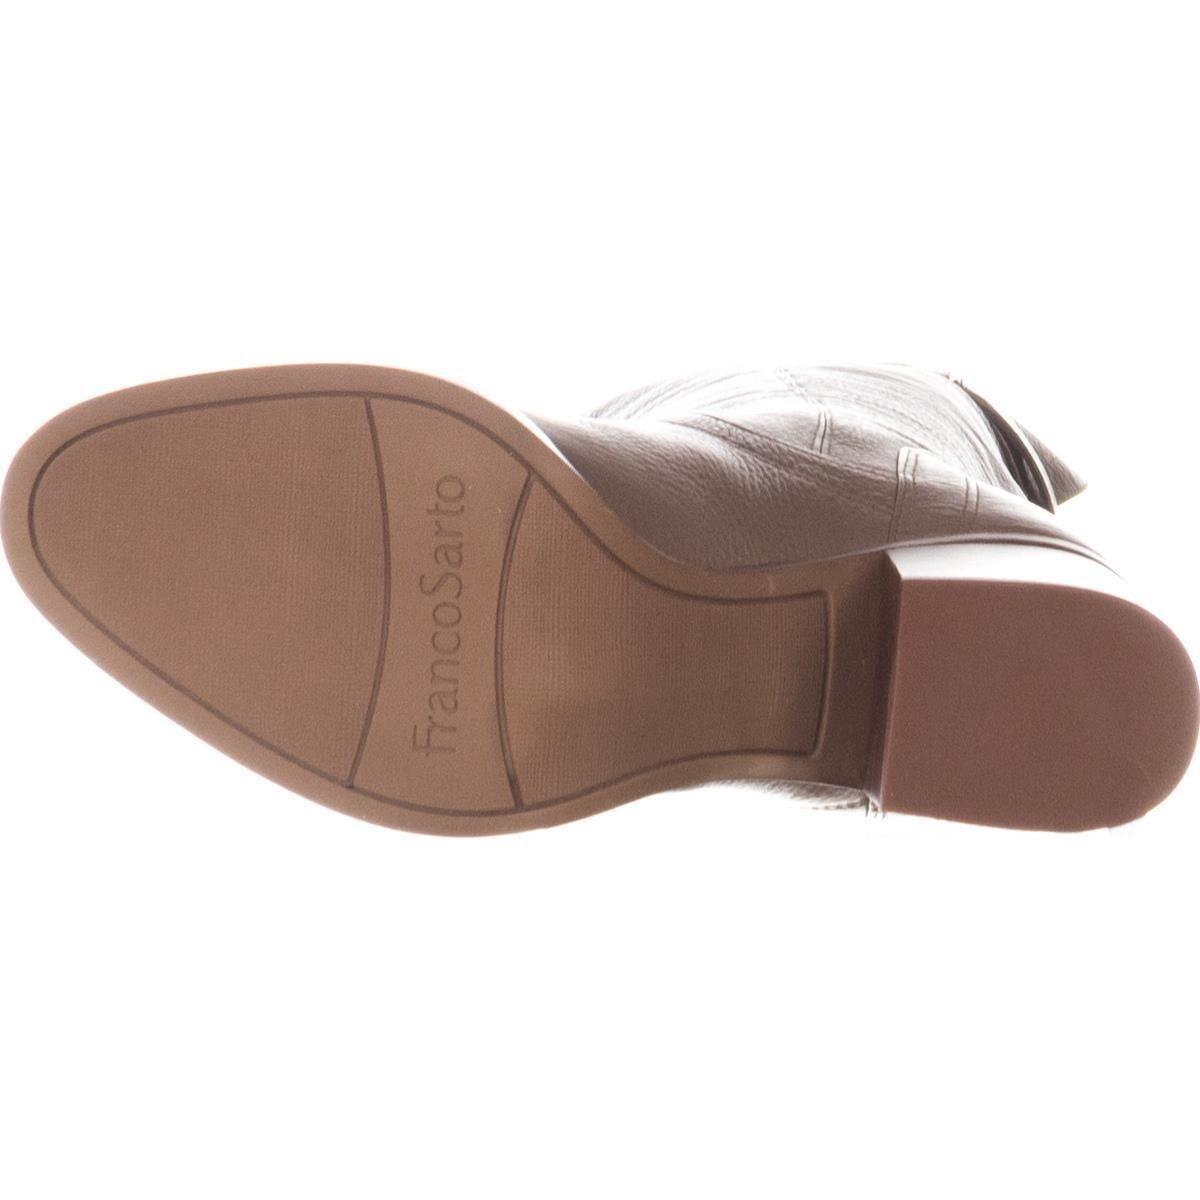 54e8d00669a Shop Franco Sarto Ollie Wide Calf Over-The-Knee Boots